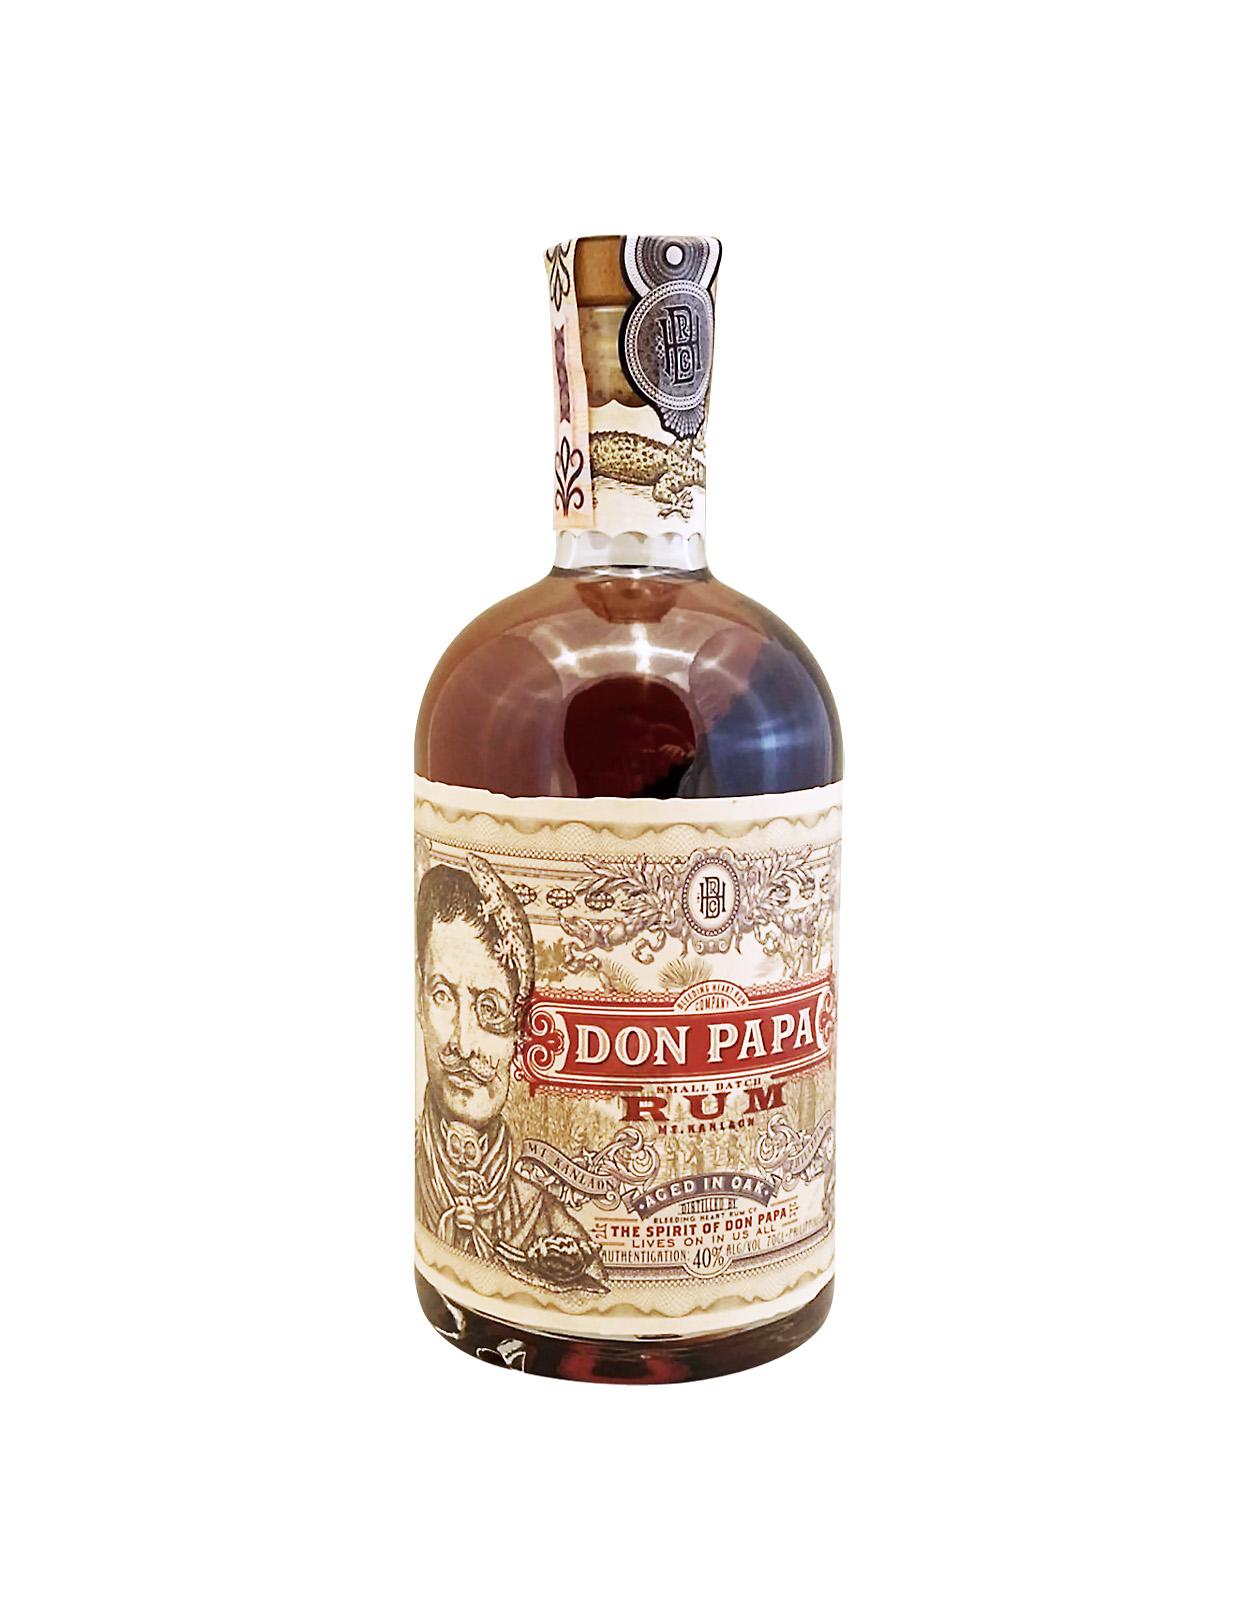 Don Papa Rum 40%, Bottleshop Sunny wines slnecnice mesto, petrzalka, rum, rumy, rozvoz alkoholu, eshop